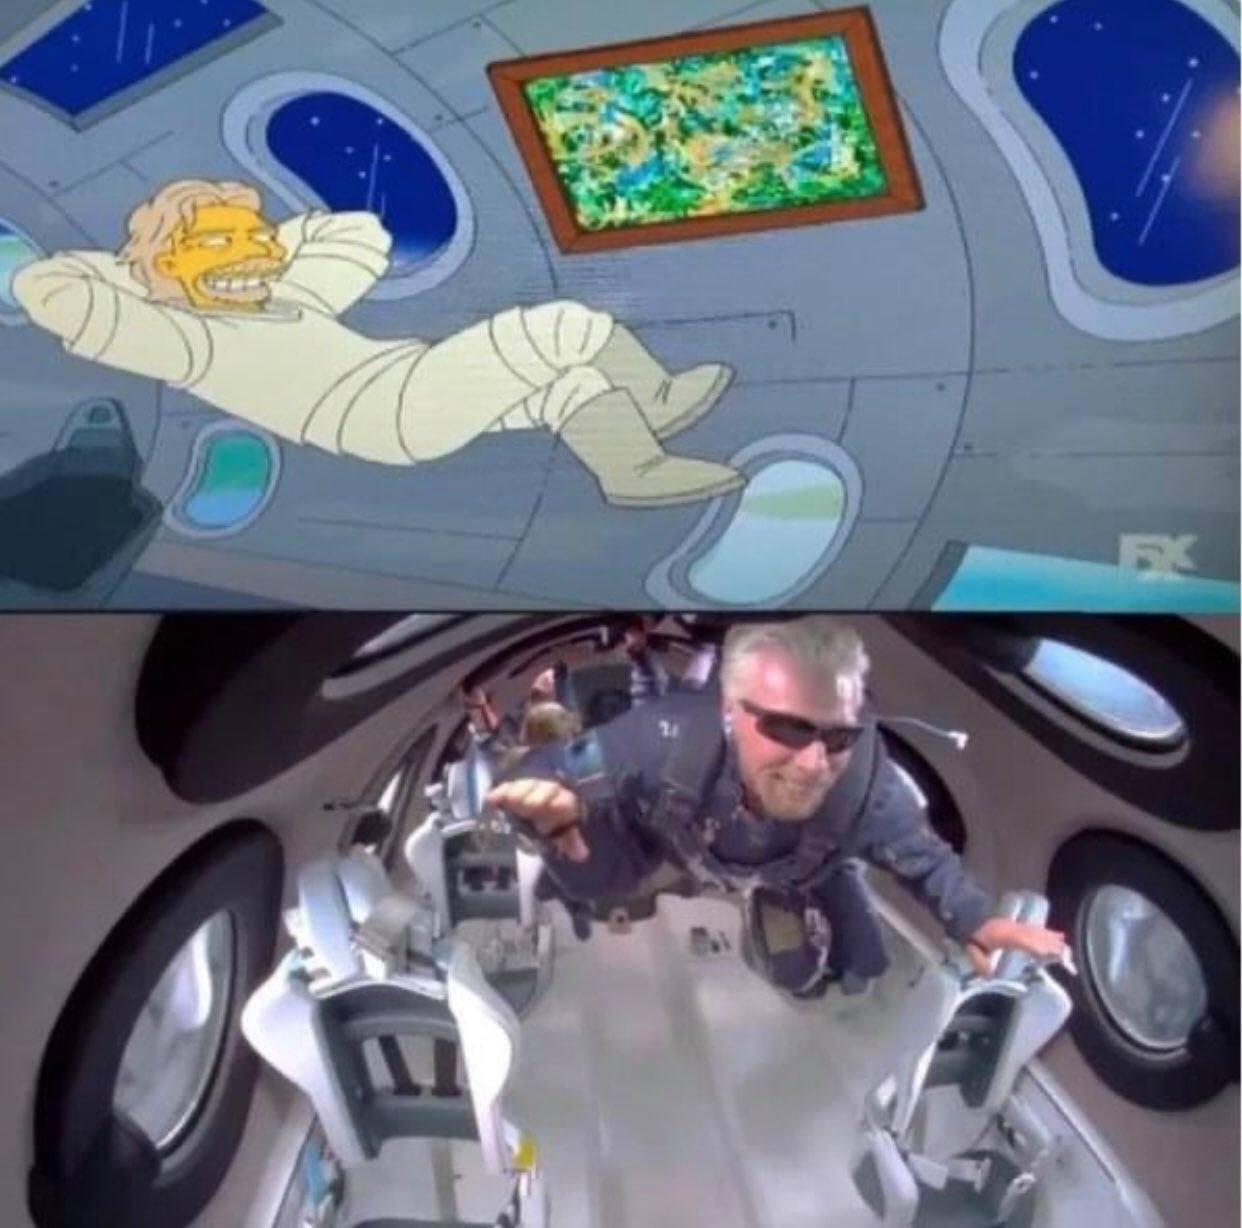 The Simpsons cartoons predicted Richard Branson's flight into space